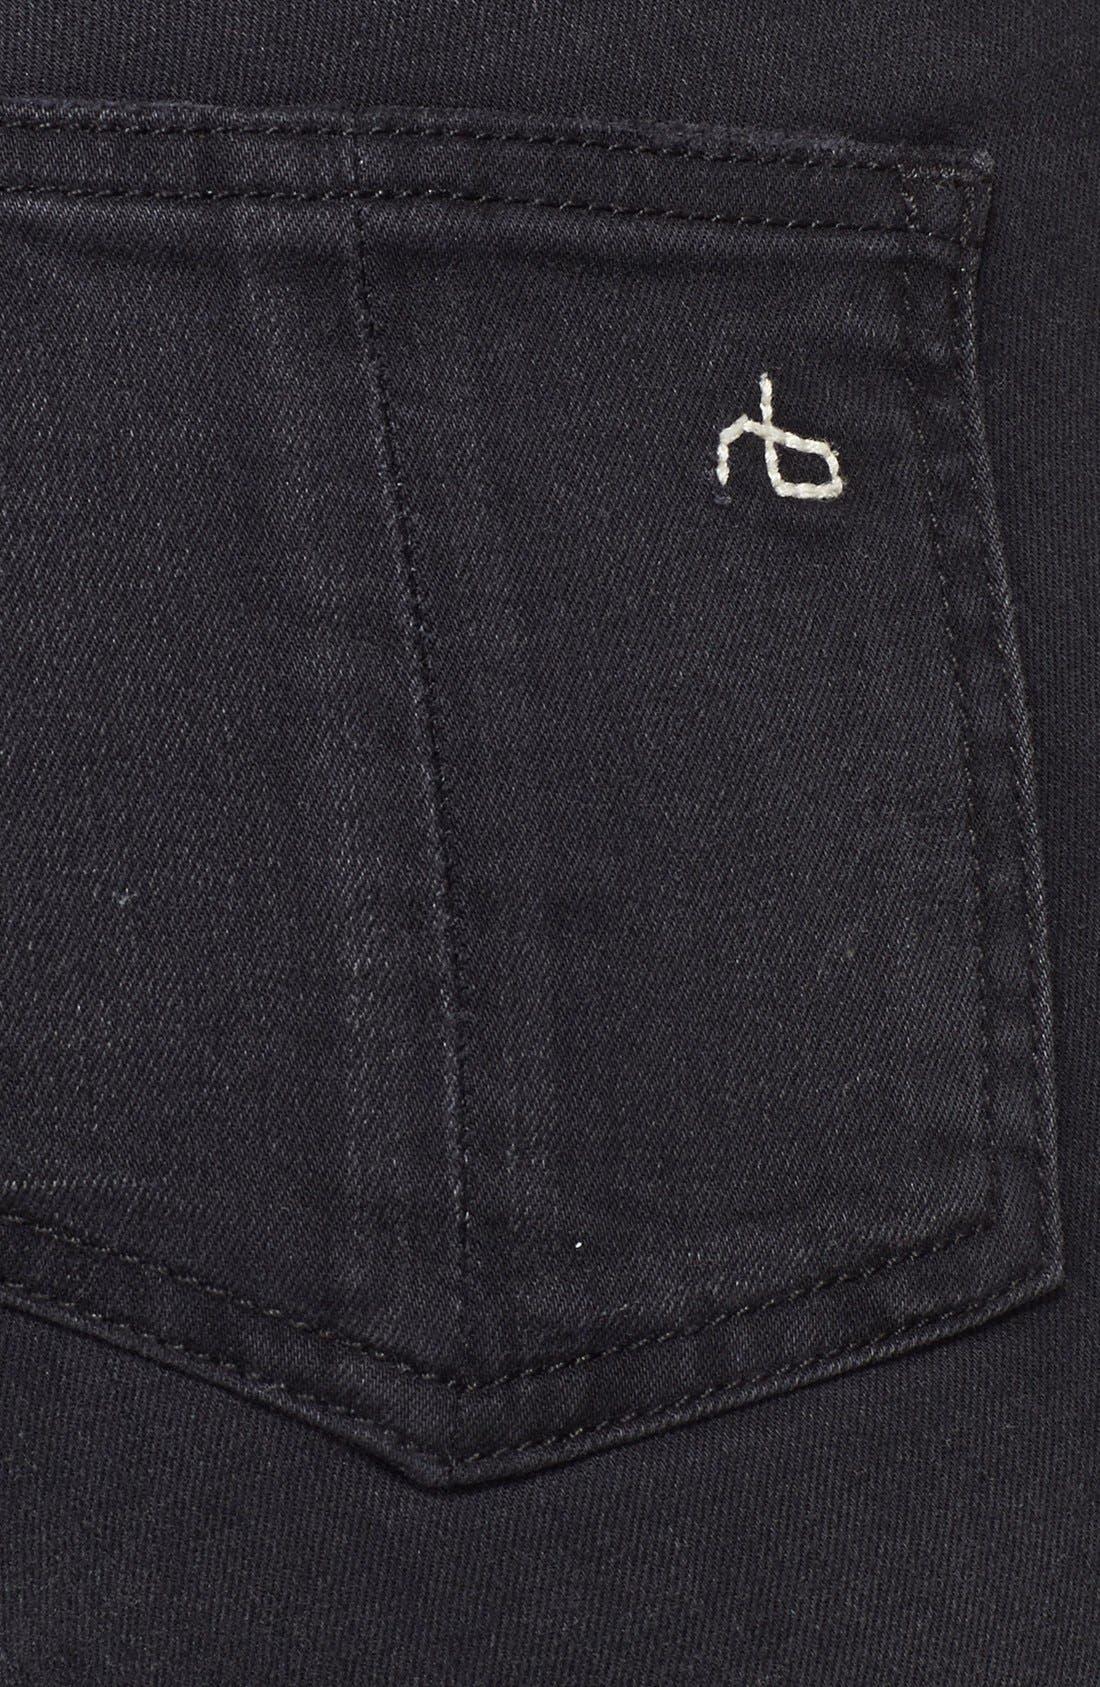 RAG & BONE,                             JEAN High Rise Ultra Skinny Jeans,                             Alternate thumbnail 3, color,                             001